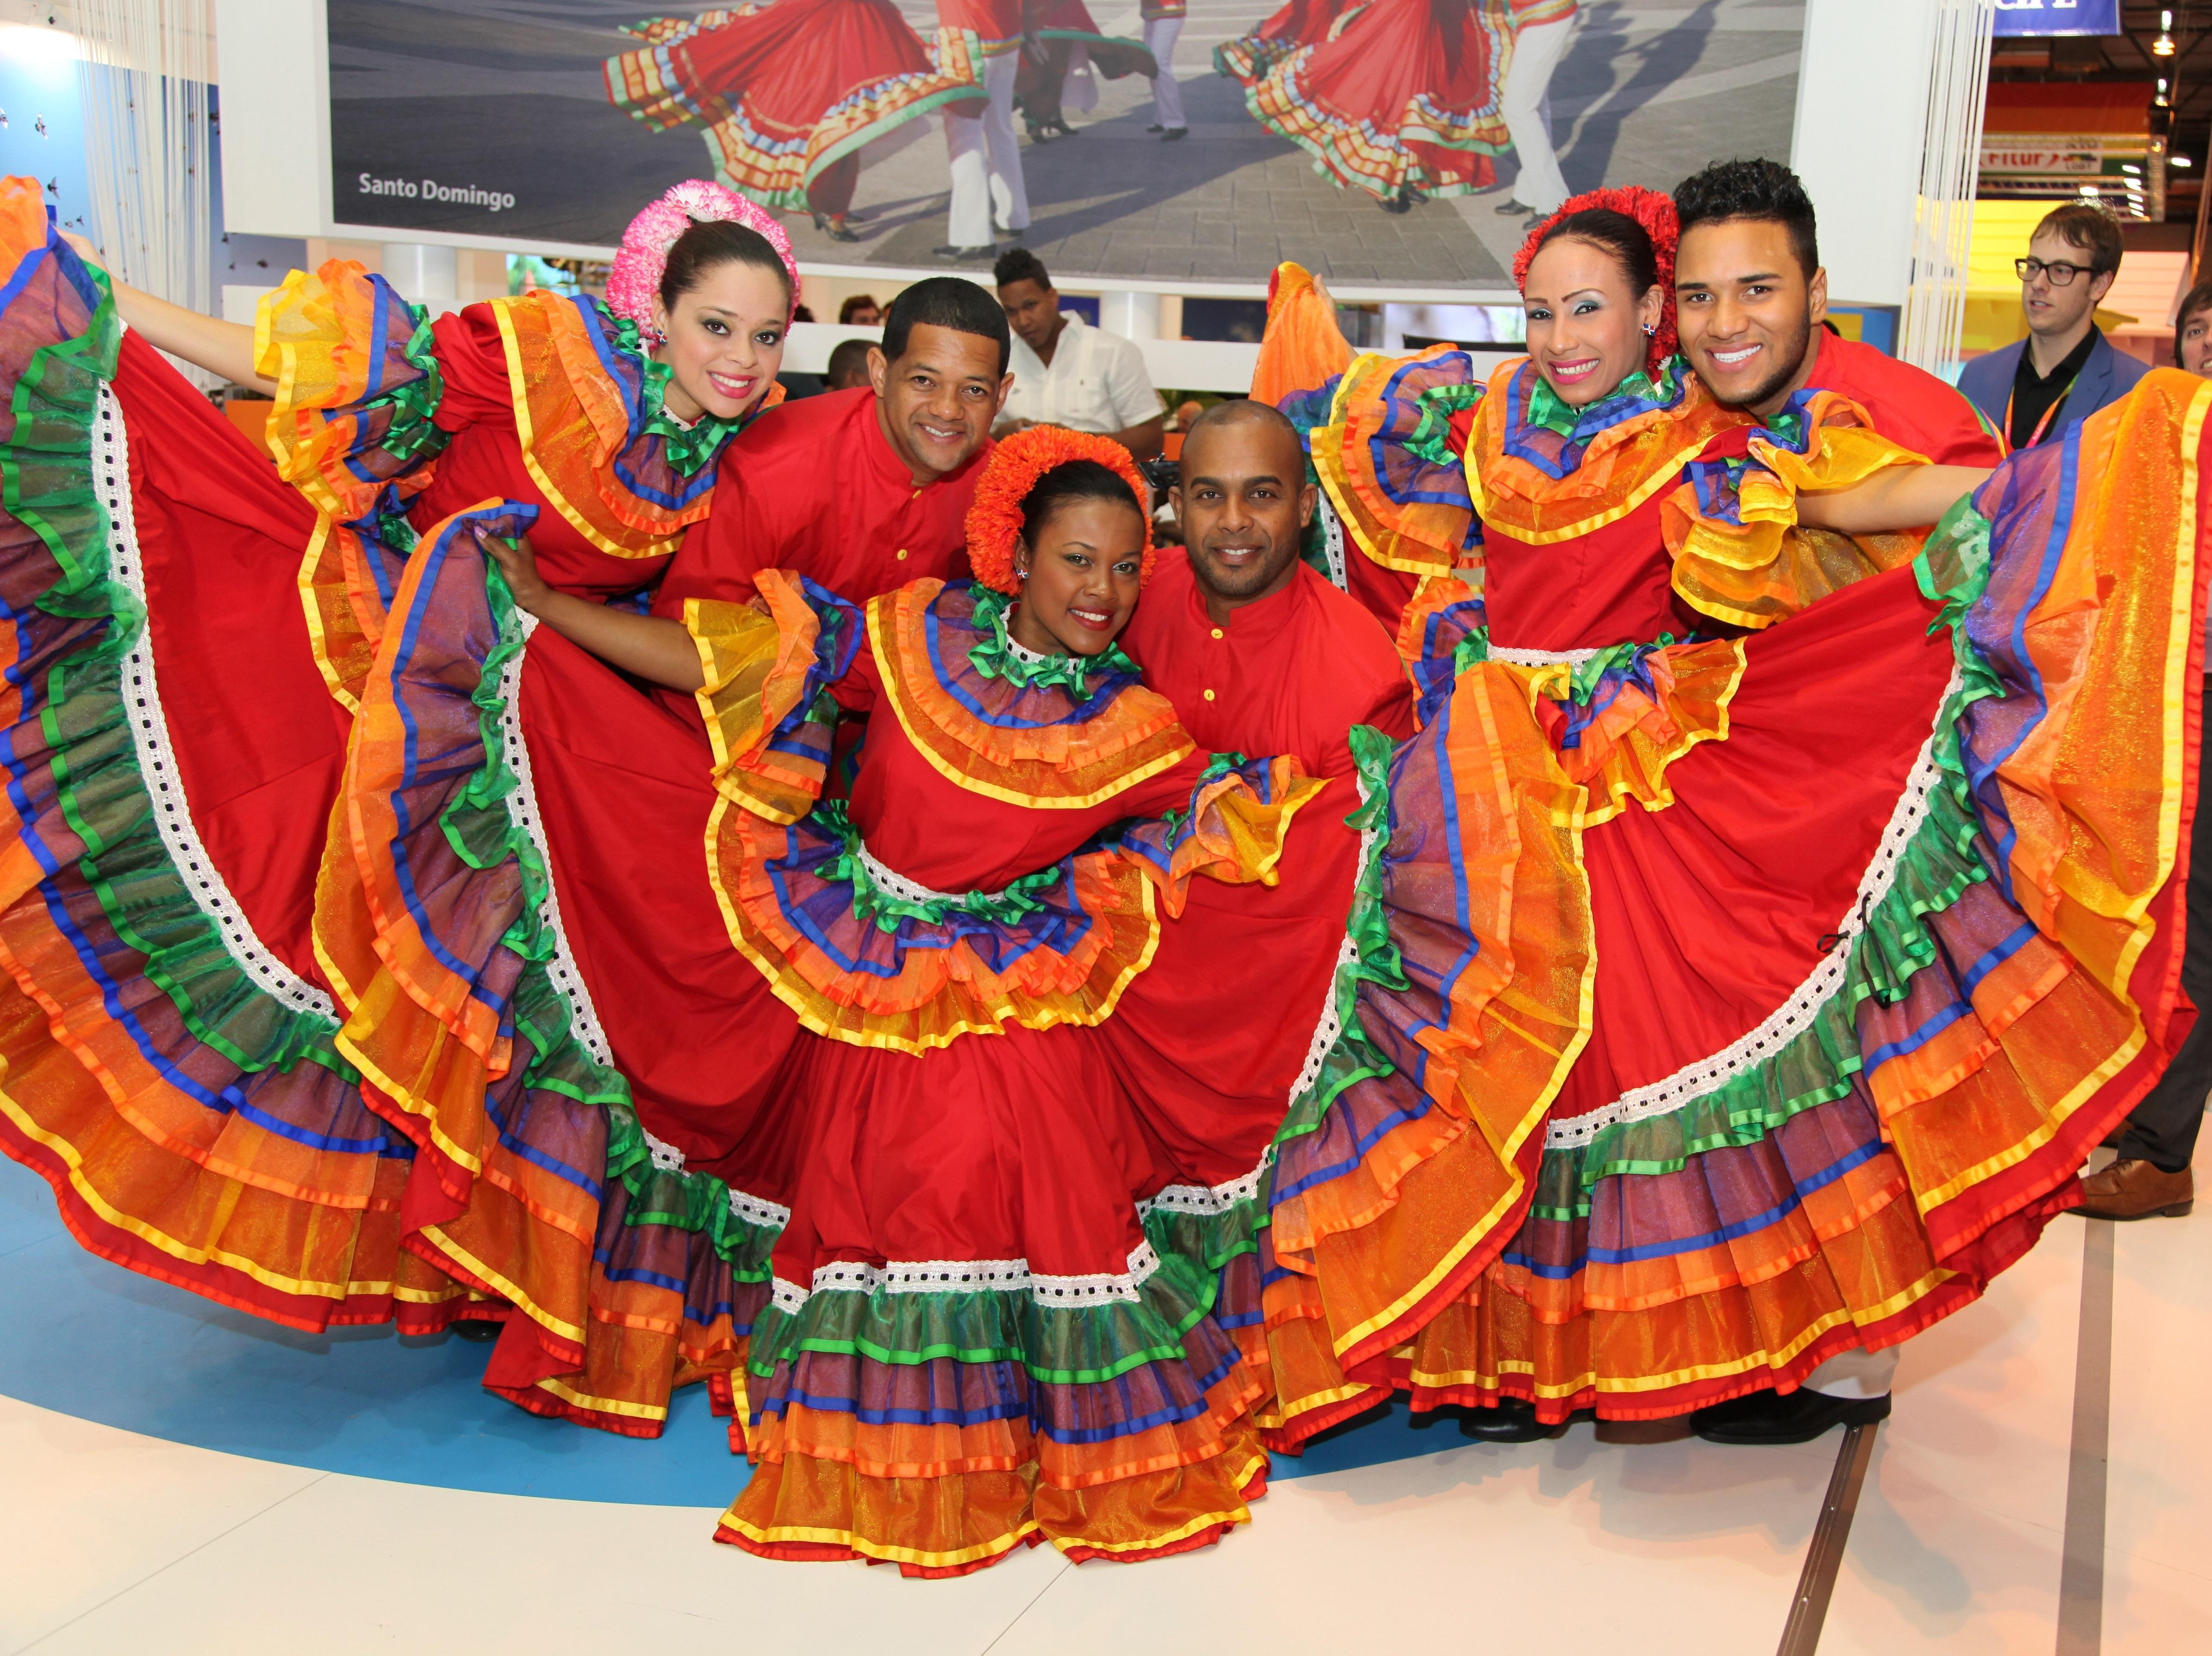 Ballet Folklórico de República Dominicana